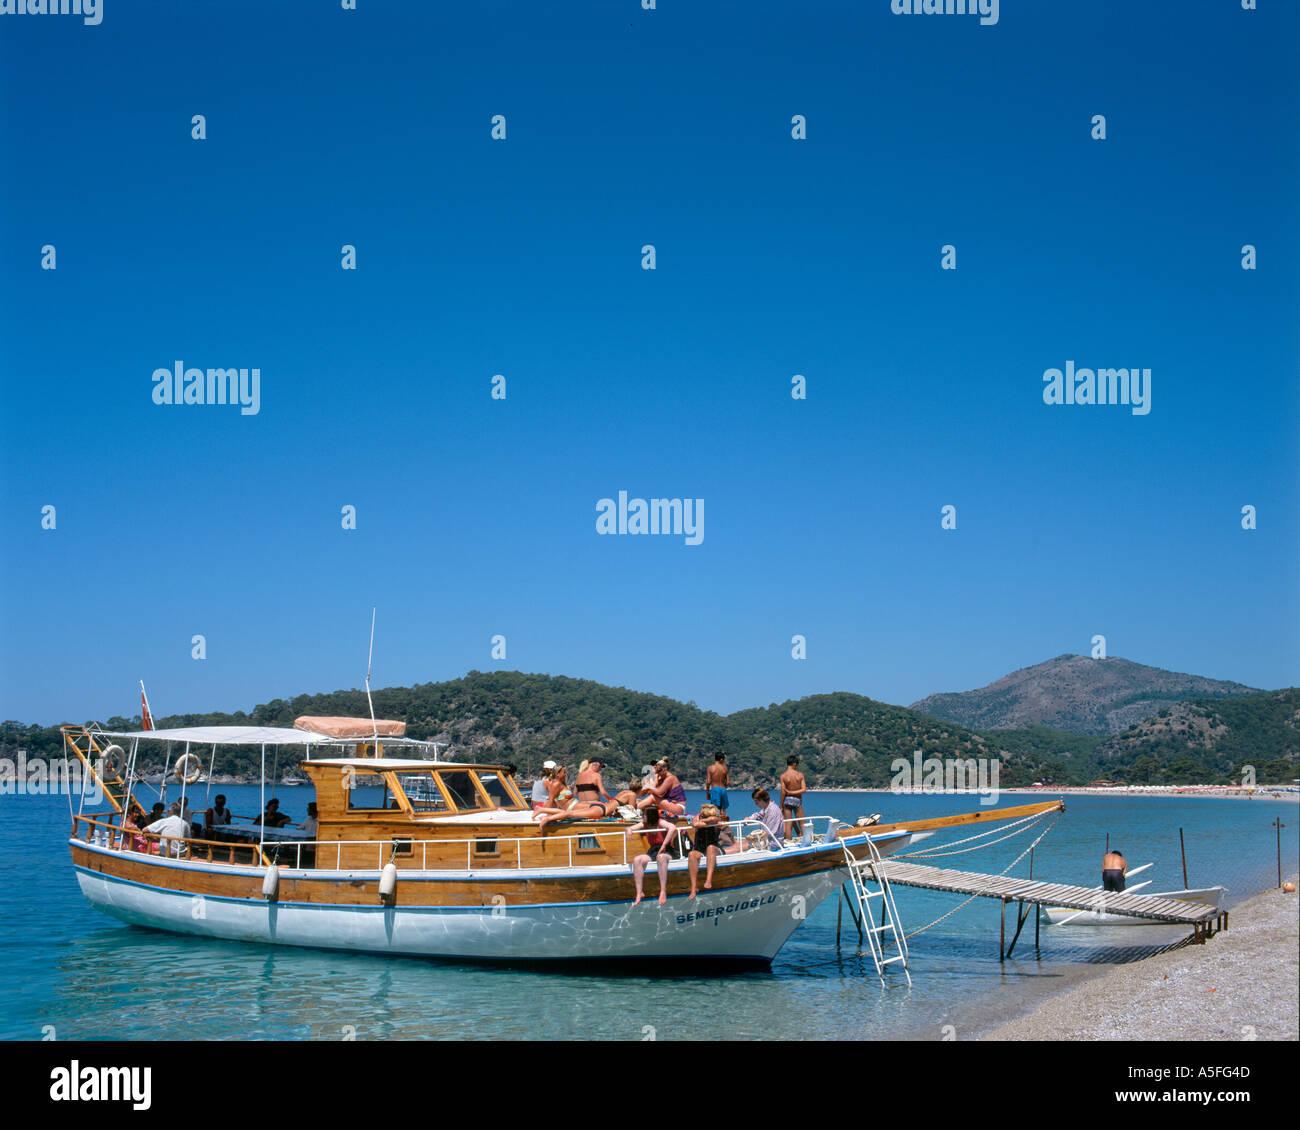 Ausflugsschiff am Strand von Olu Deniz, Fethiye, Türkei Stockbild